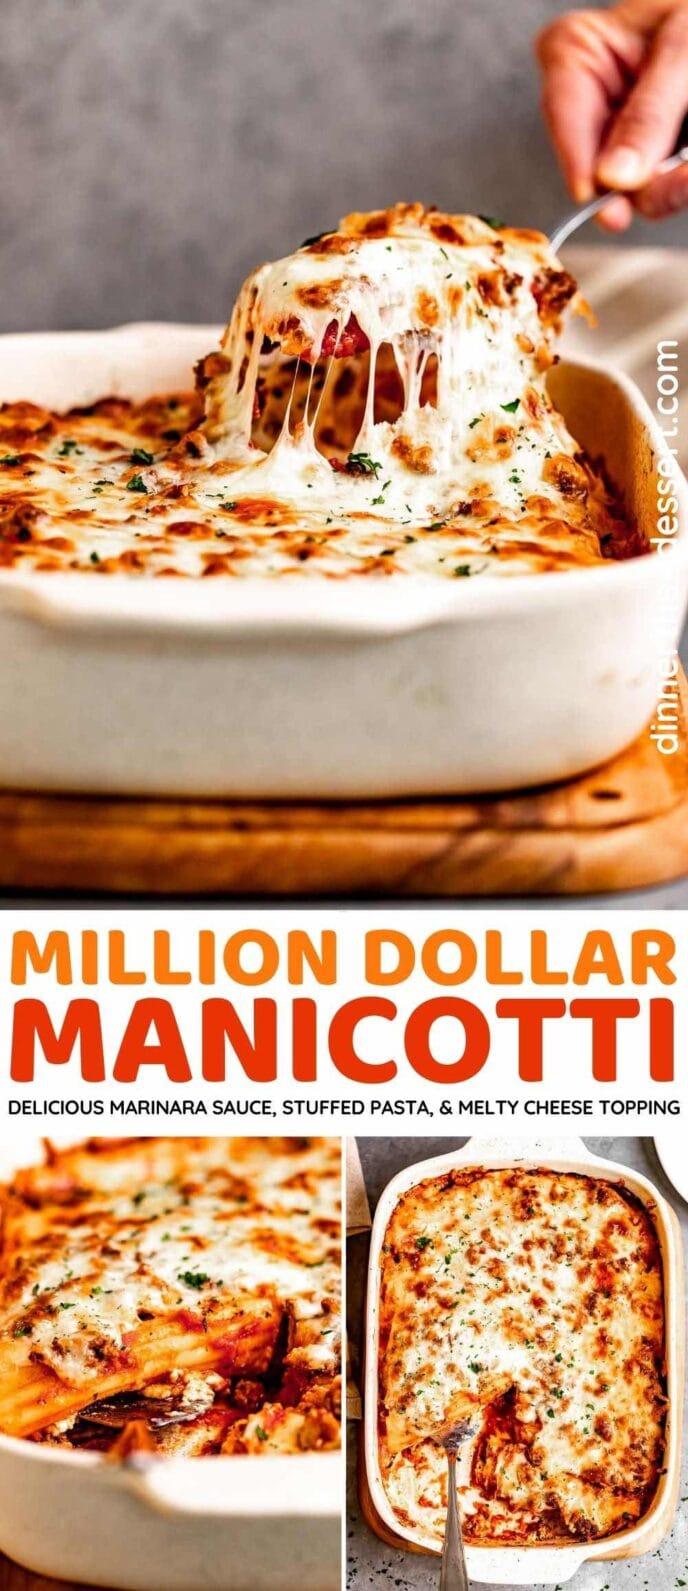 Million Dollar Manicotti collage